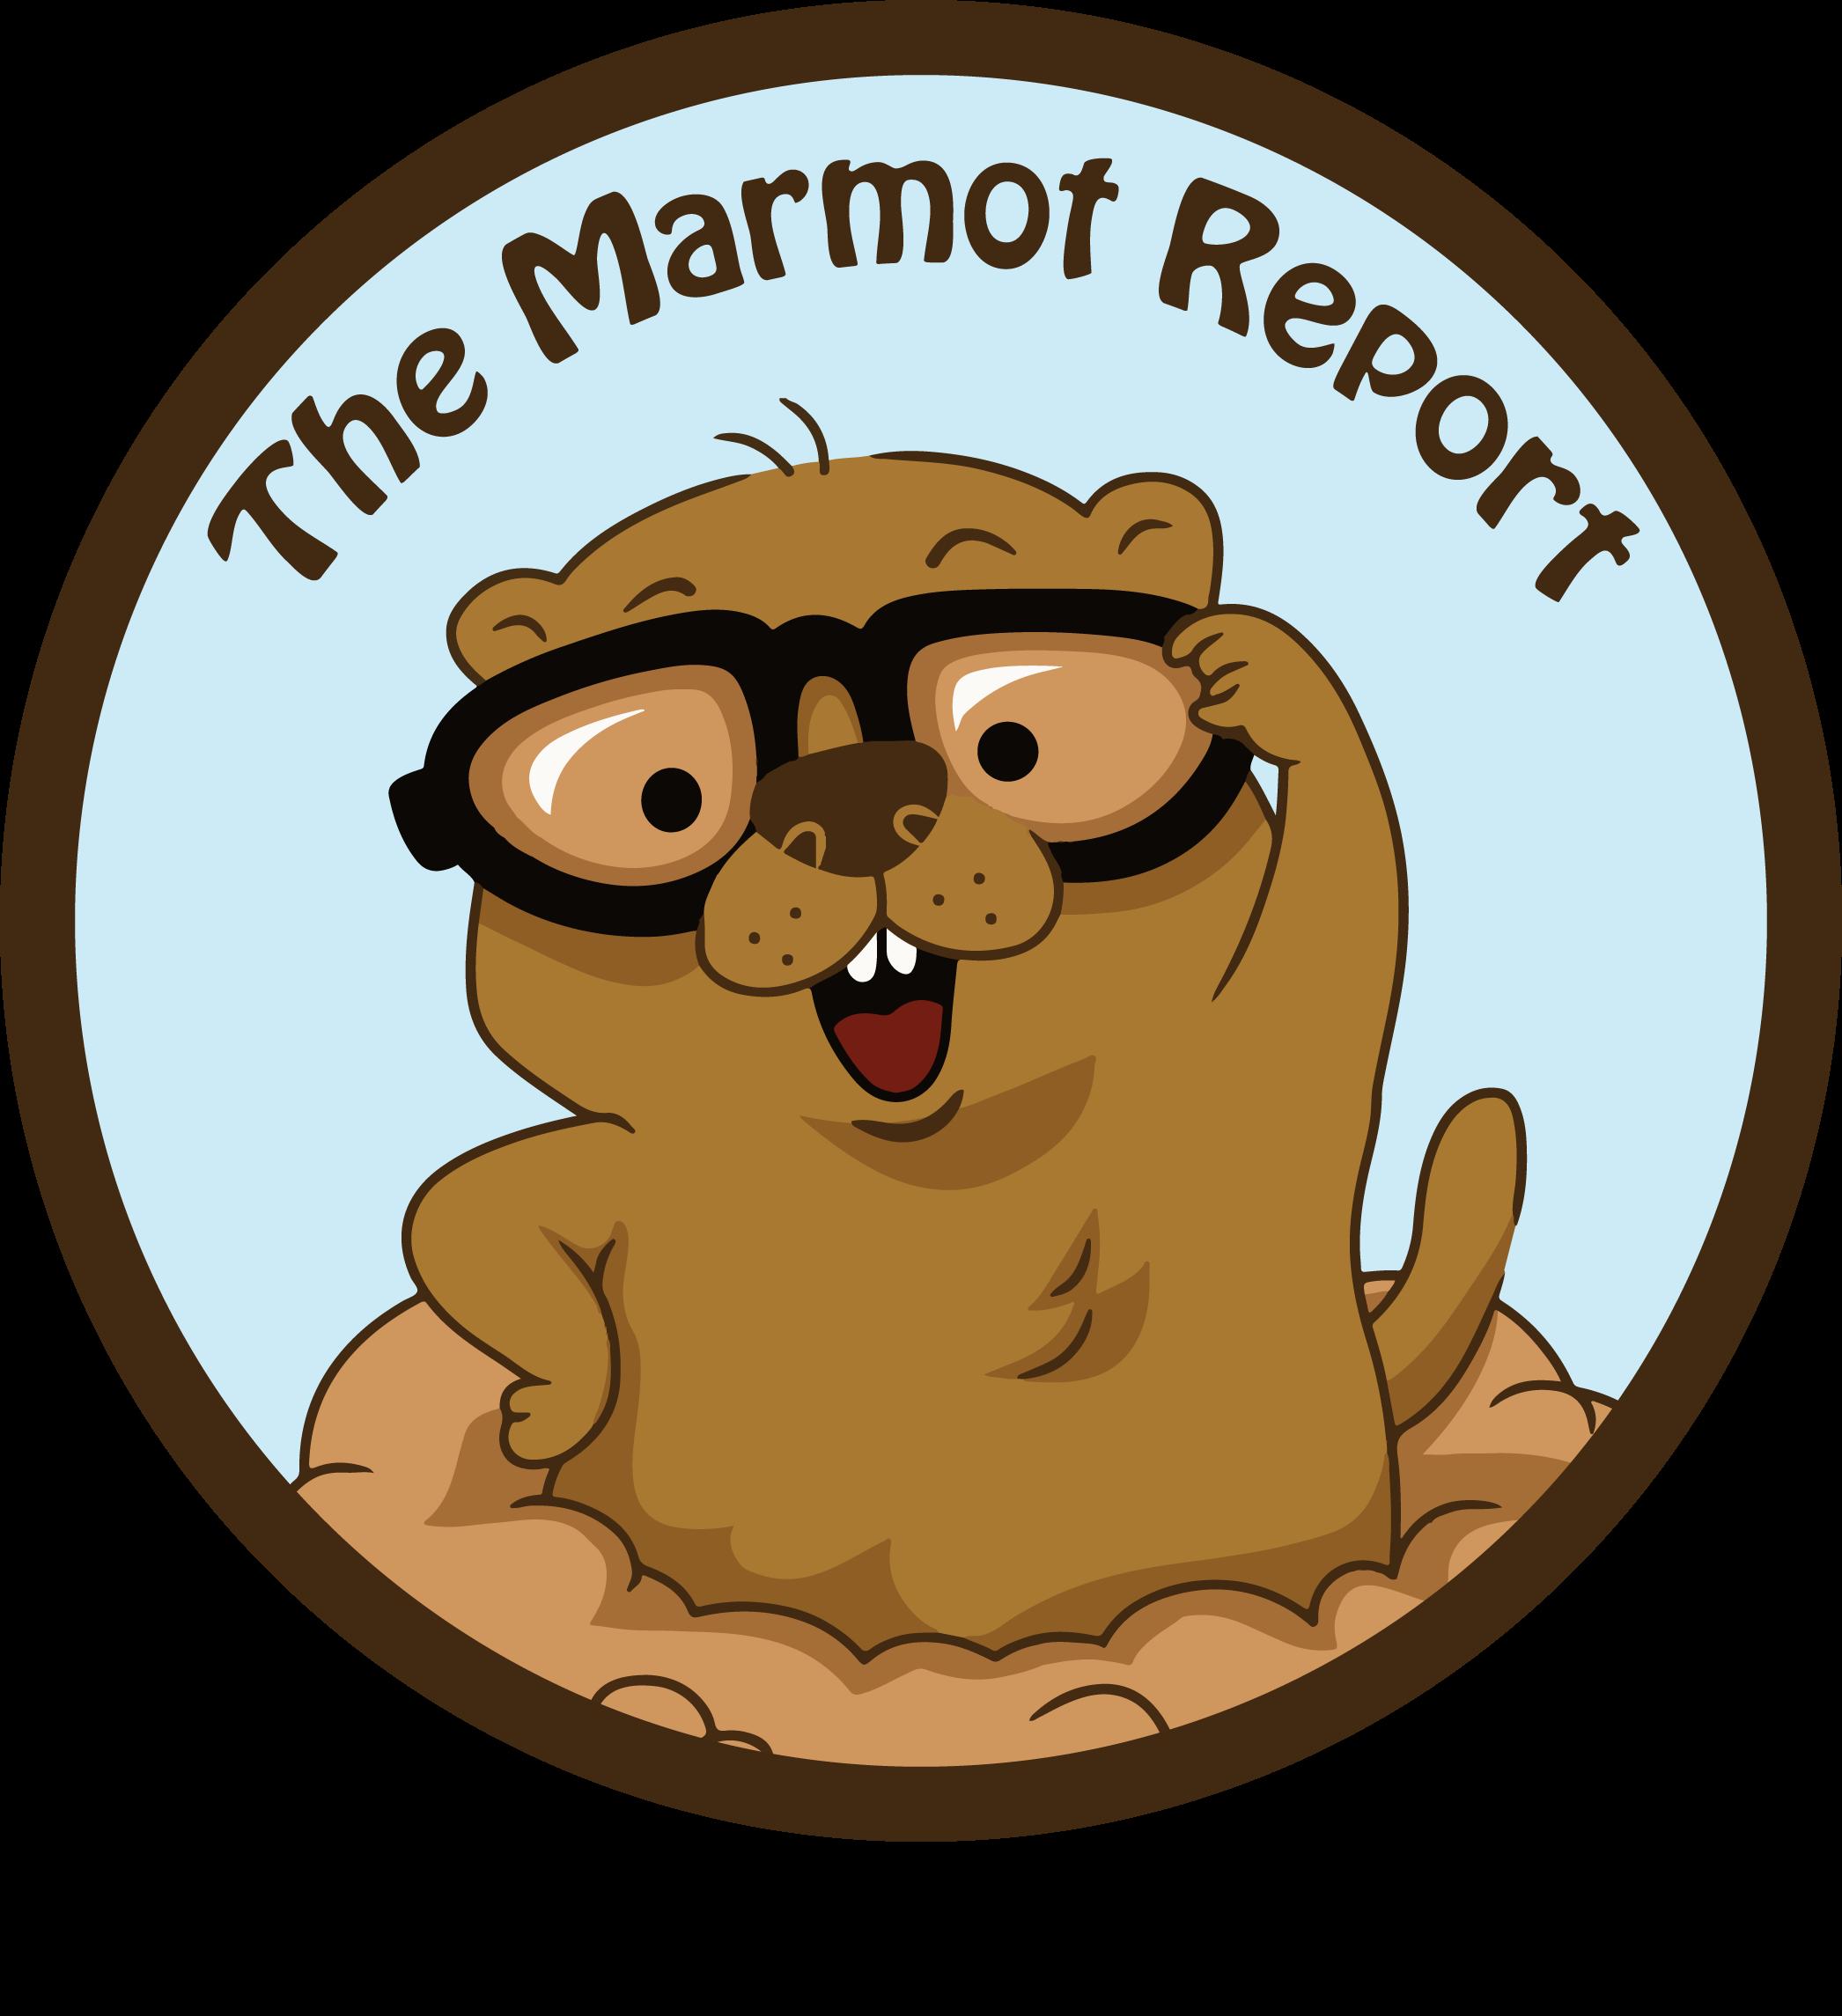 Groundhog clipart groundhog burrow. The marmot report a